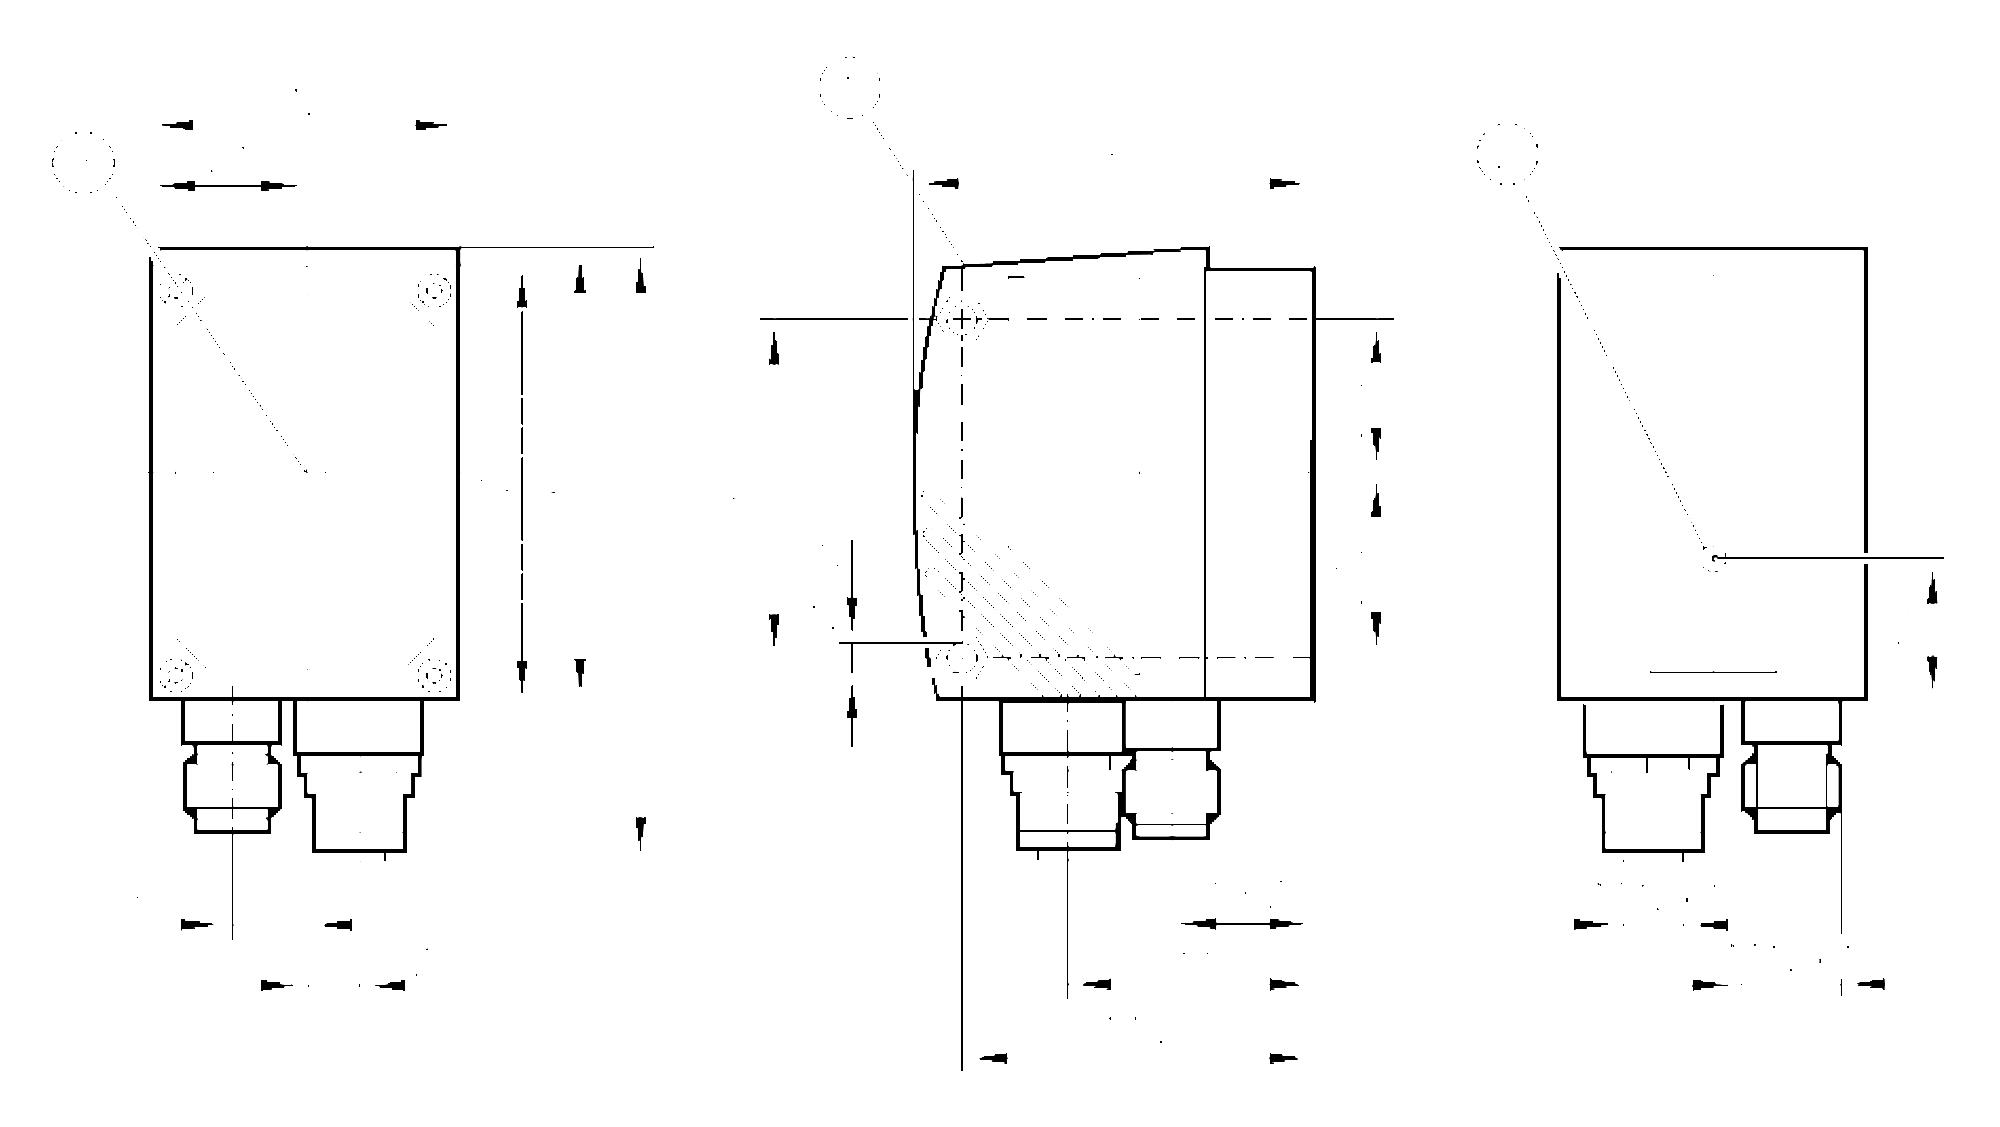 o2d220 - object recognition sensor